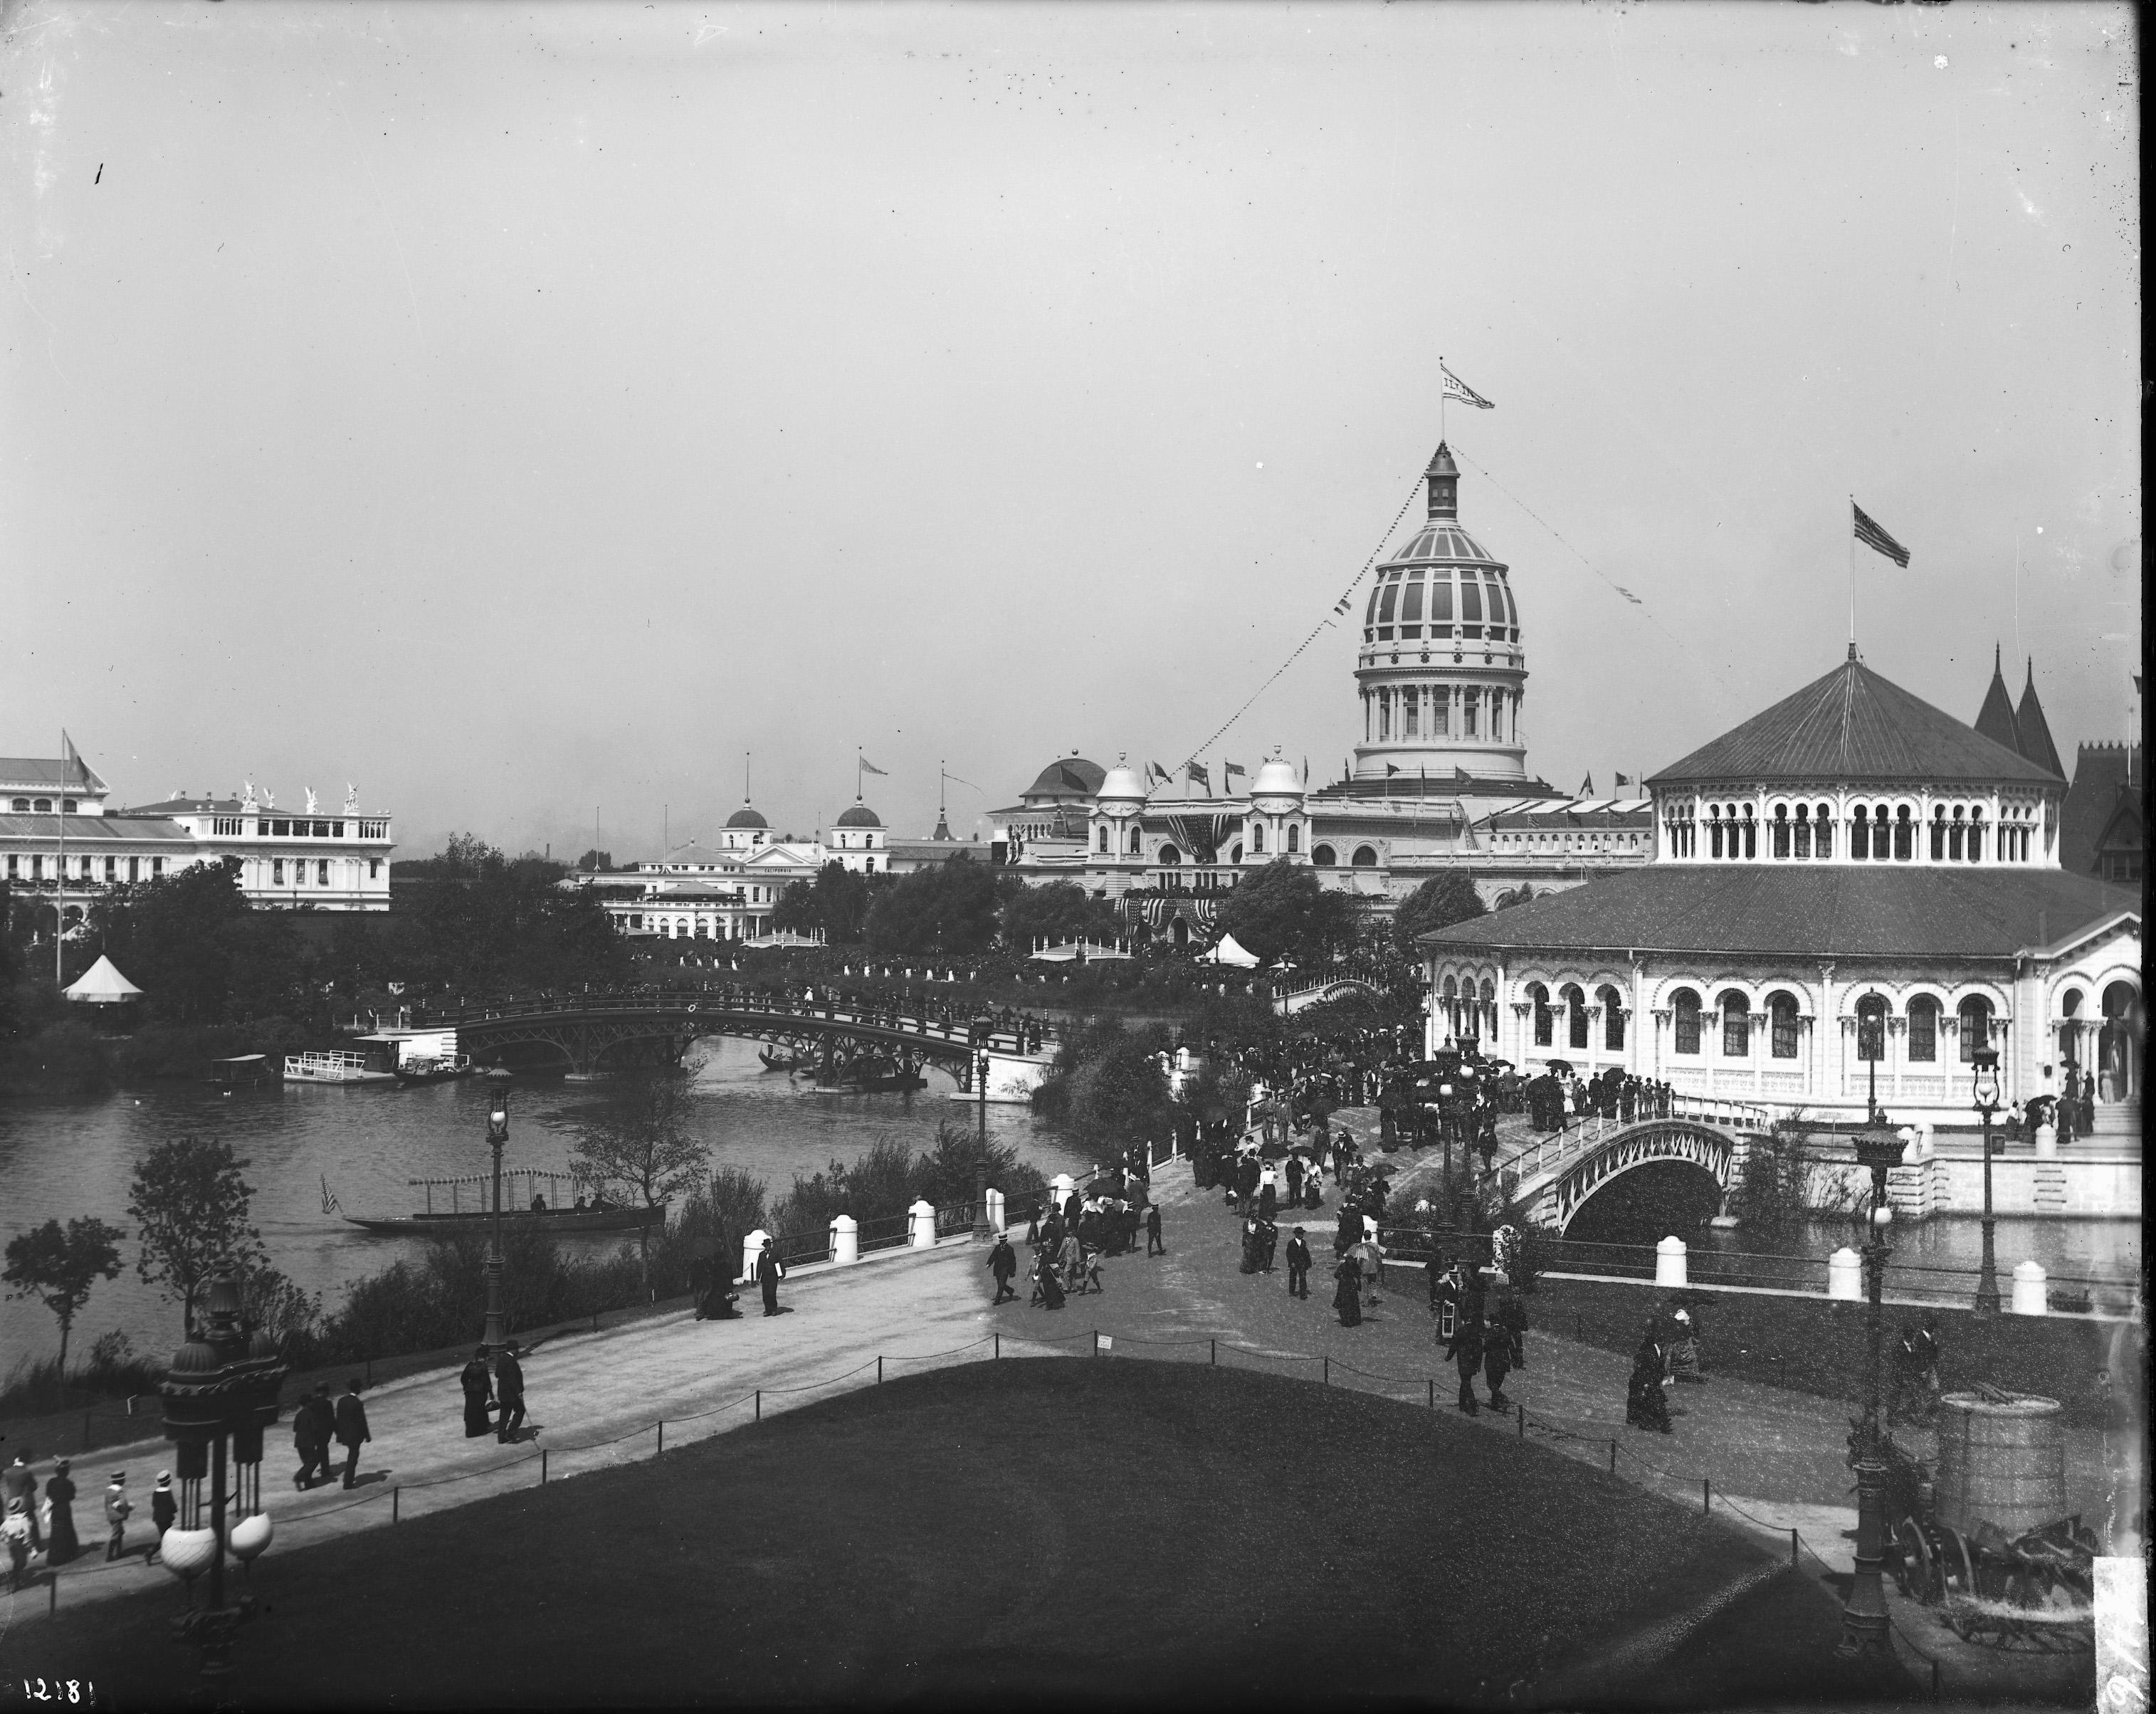 File:Chicago World's Columbian Exposition 1893.jpg